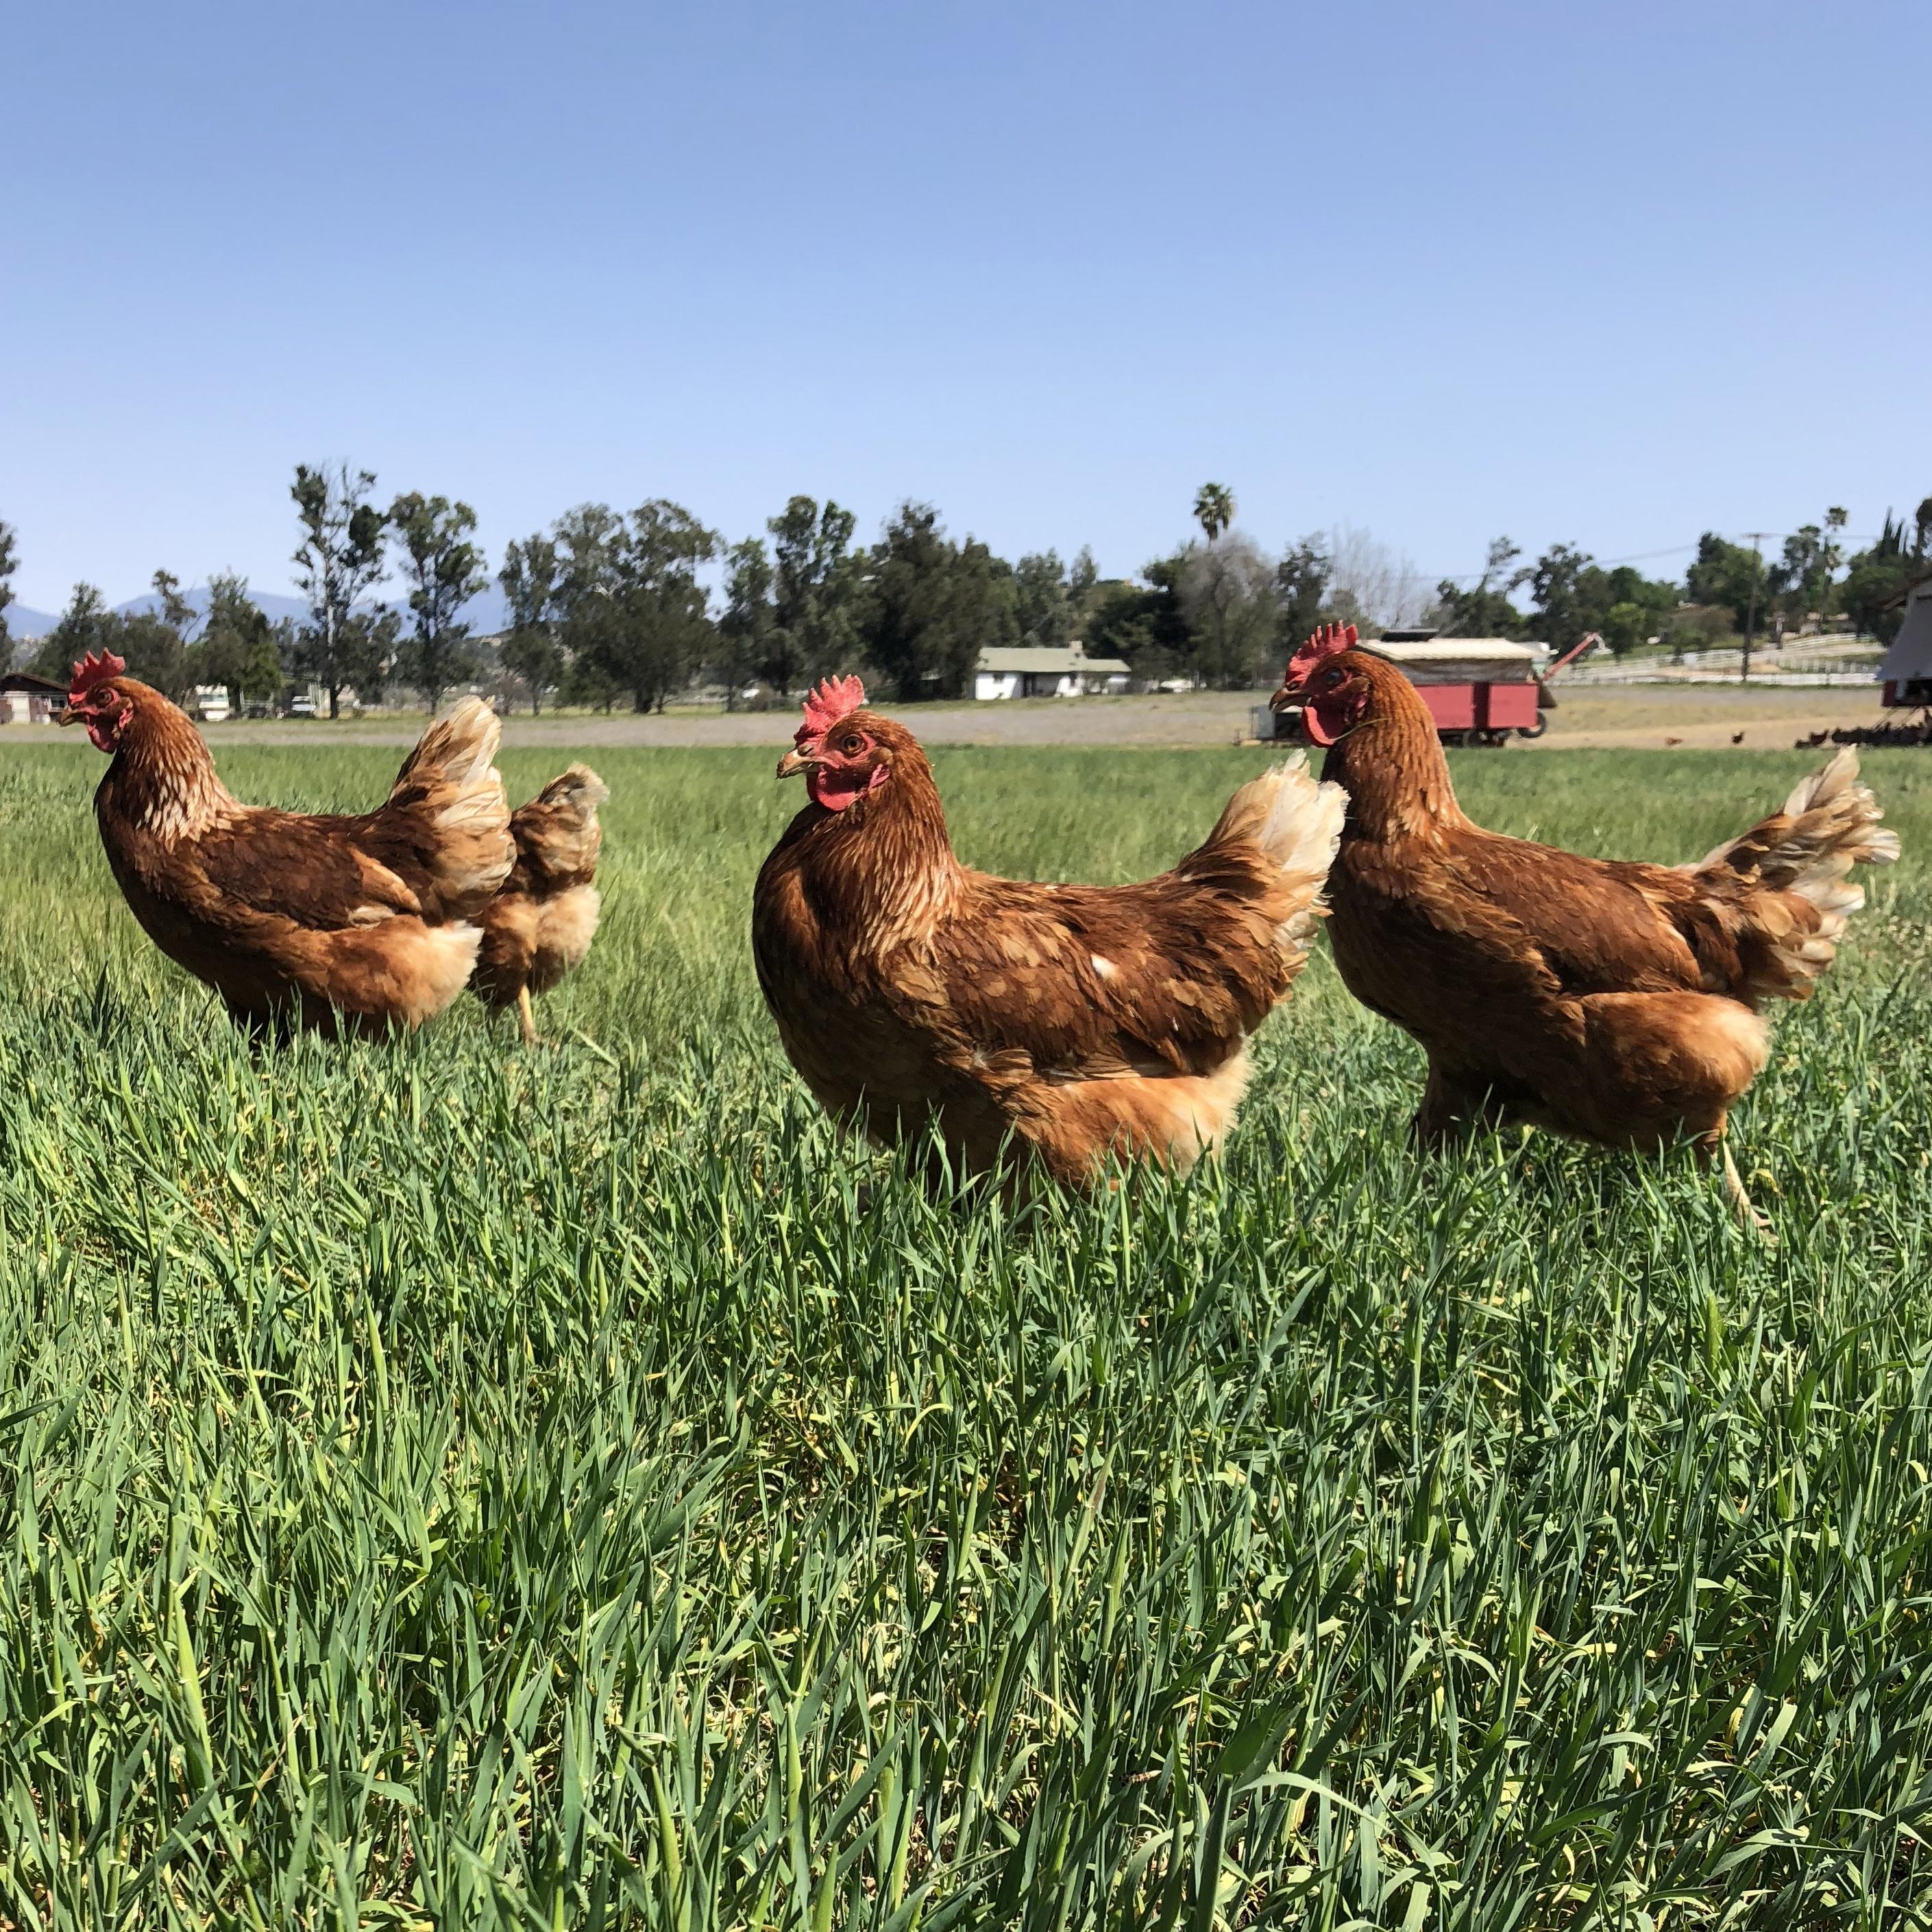 Eben-Haezer's Happy Hens | Your local source for truly